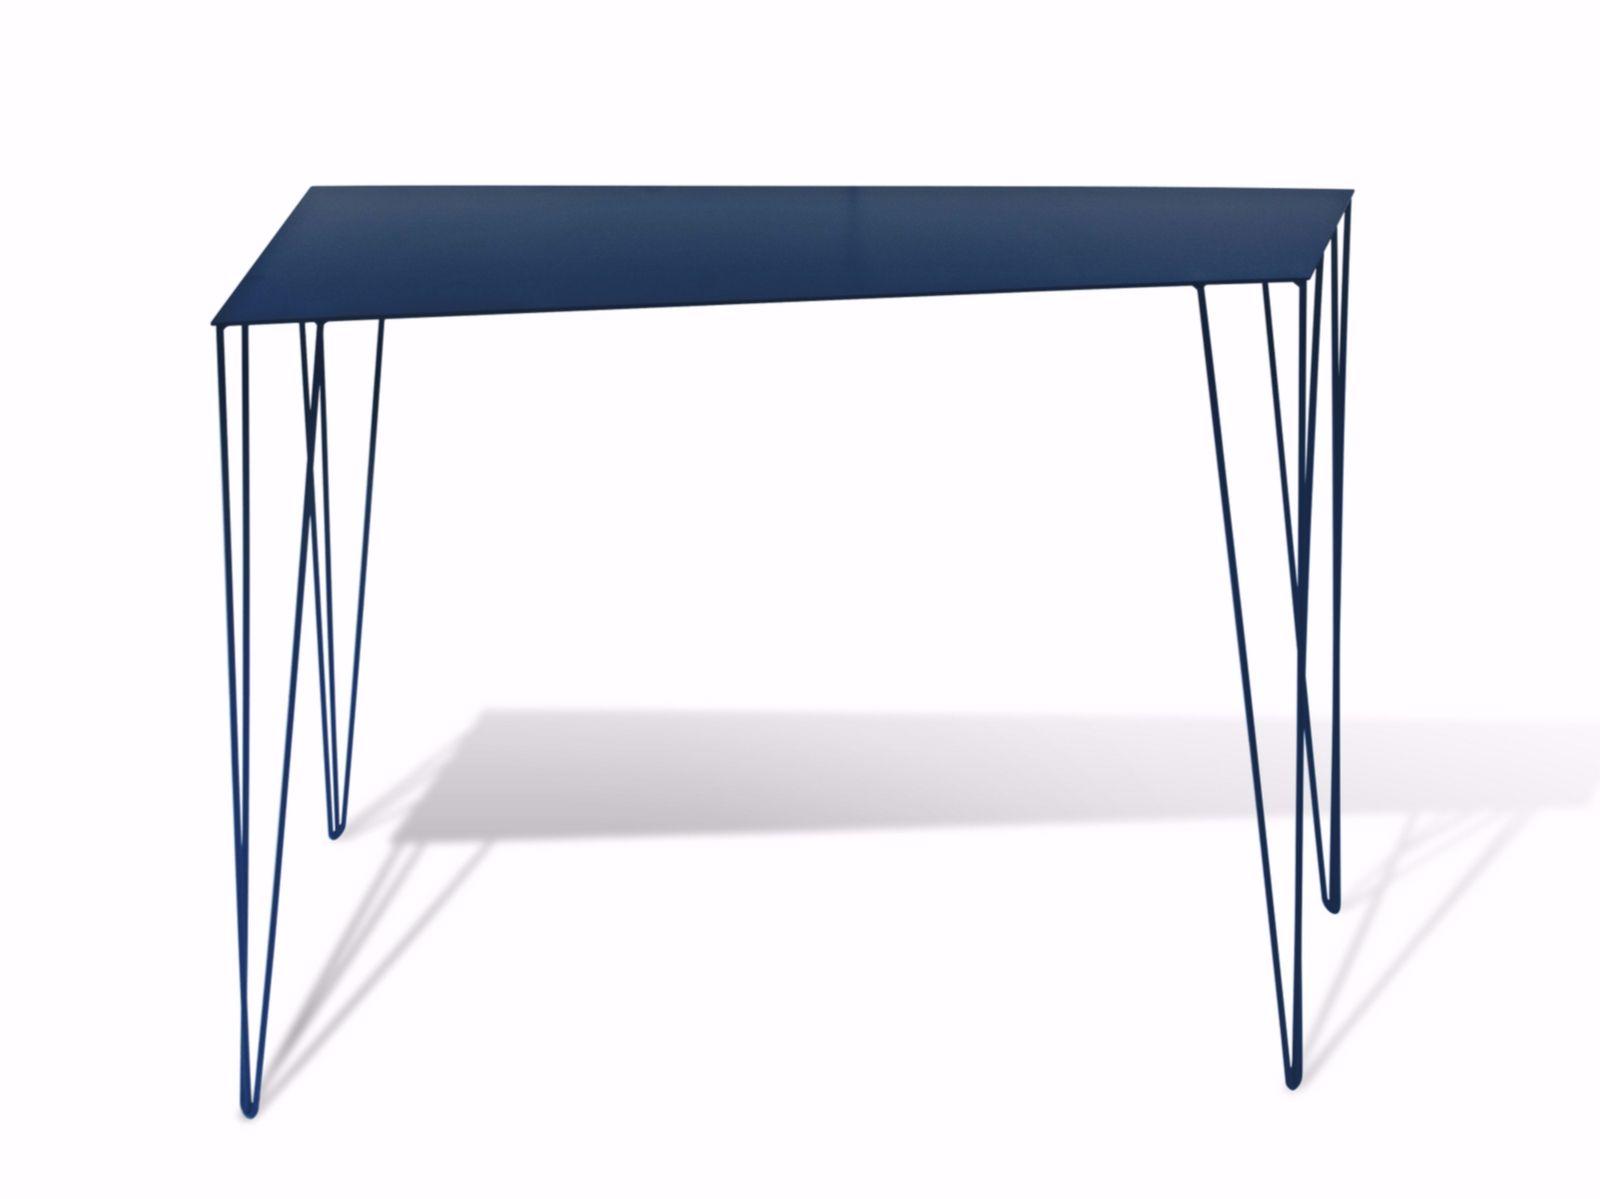 chele console table tables collection by atipico design antonino sciortino. Black Bedroom Furniture Sets. Home Design Ideas